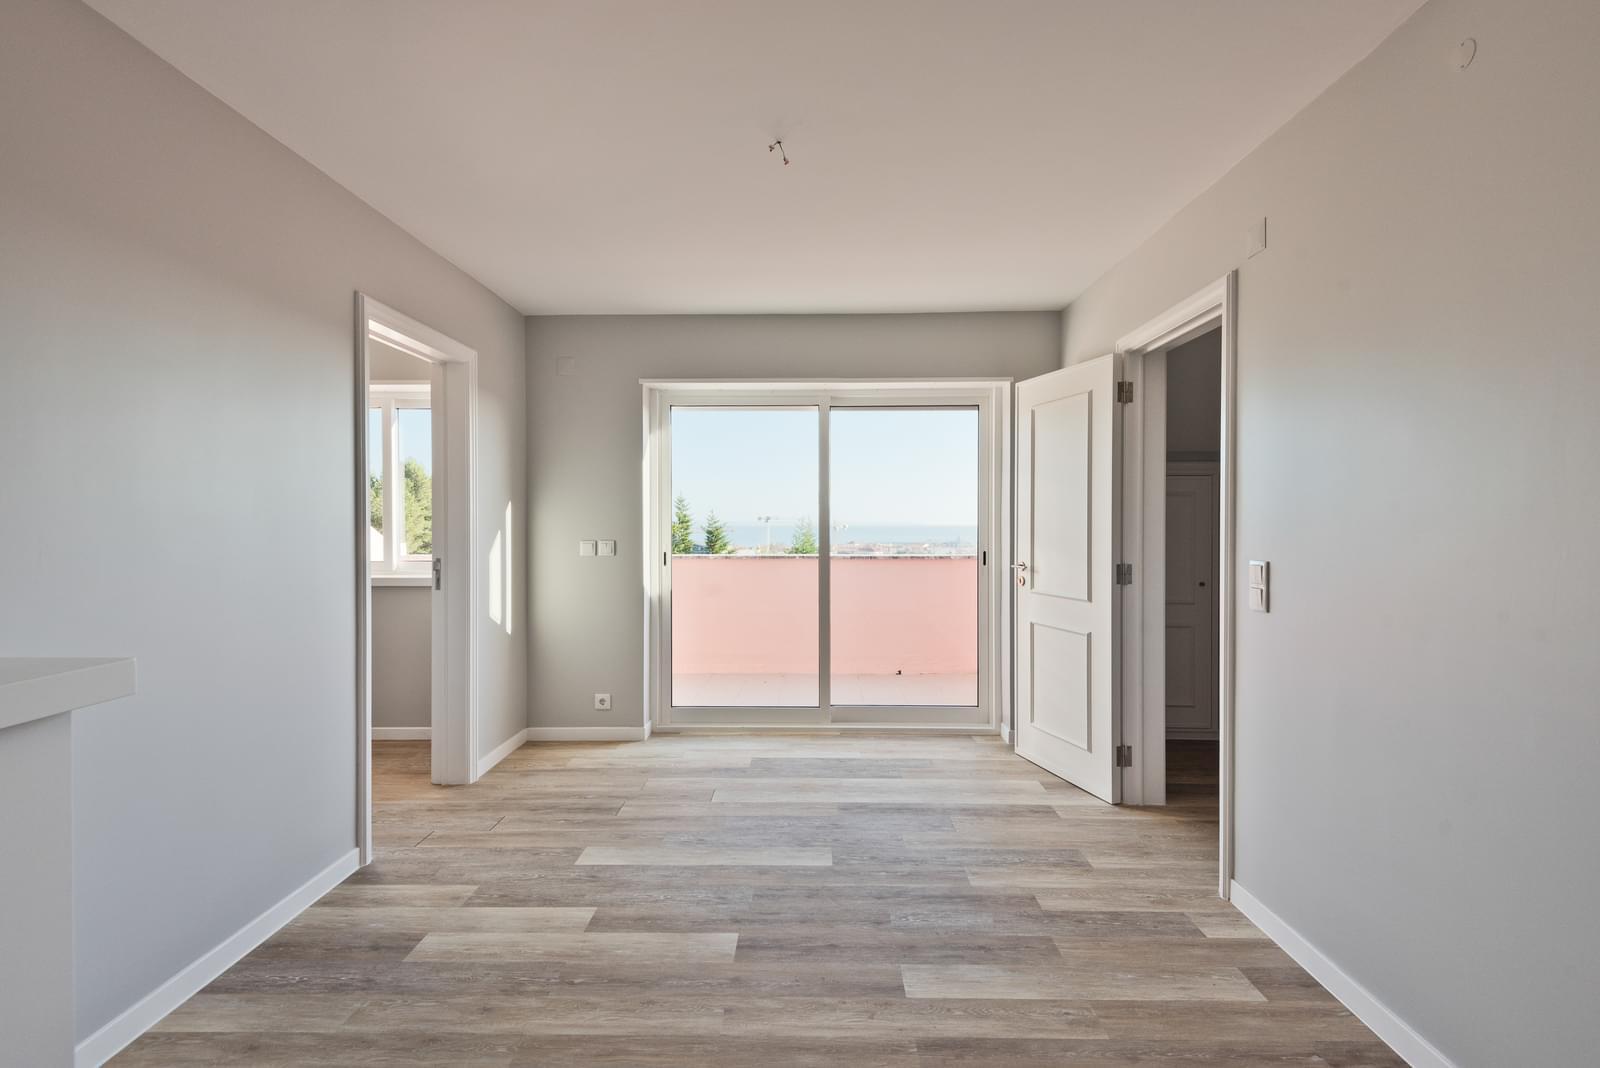 pf18956-apartamento-t3-1-cascais-a3b38fc6-ba79-4d88-8747-68f3c78b28d7